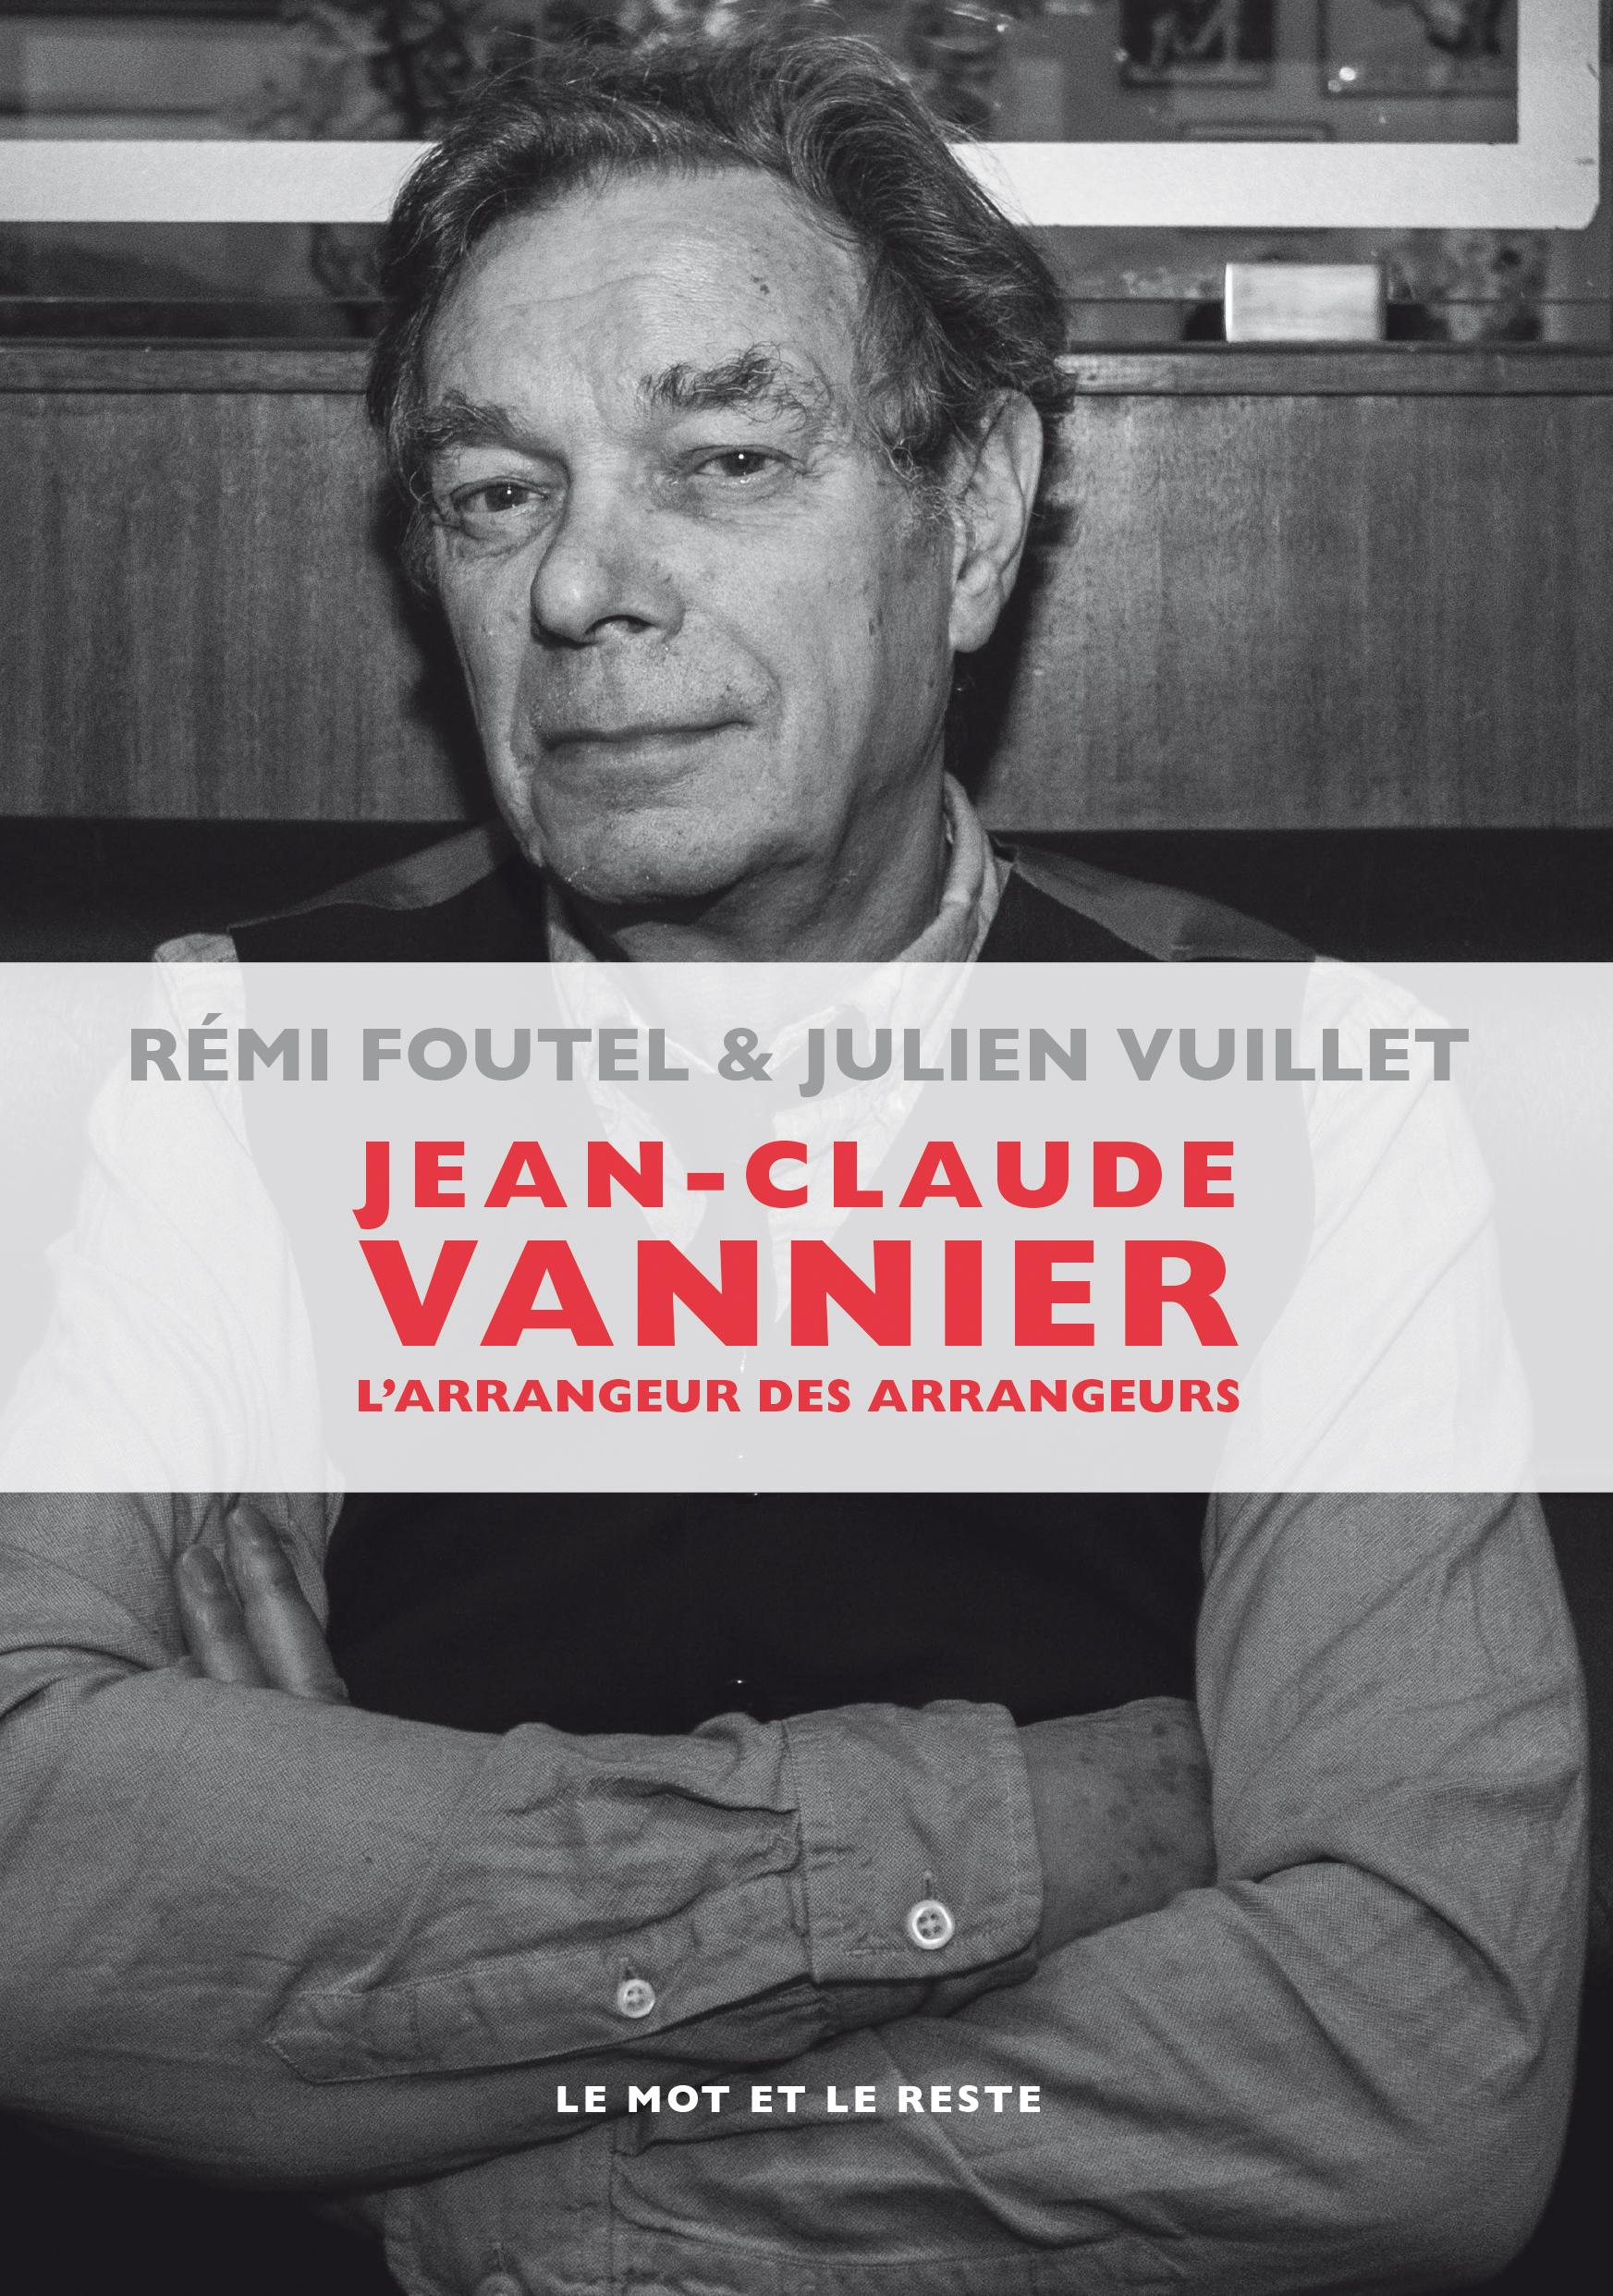 JEAN-CLAUDE VANNIER en conférence